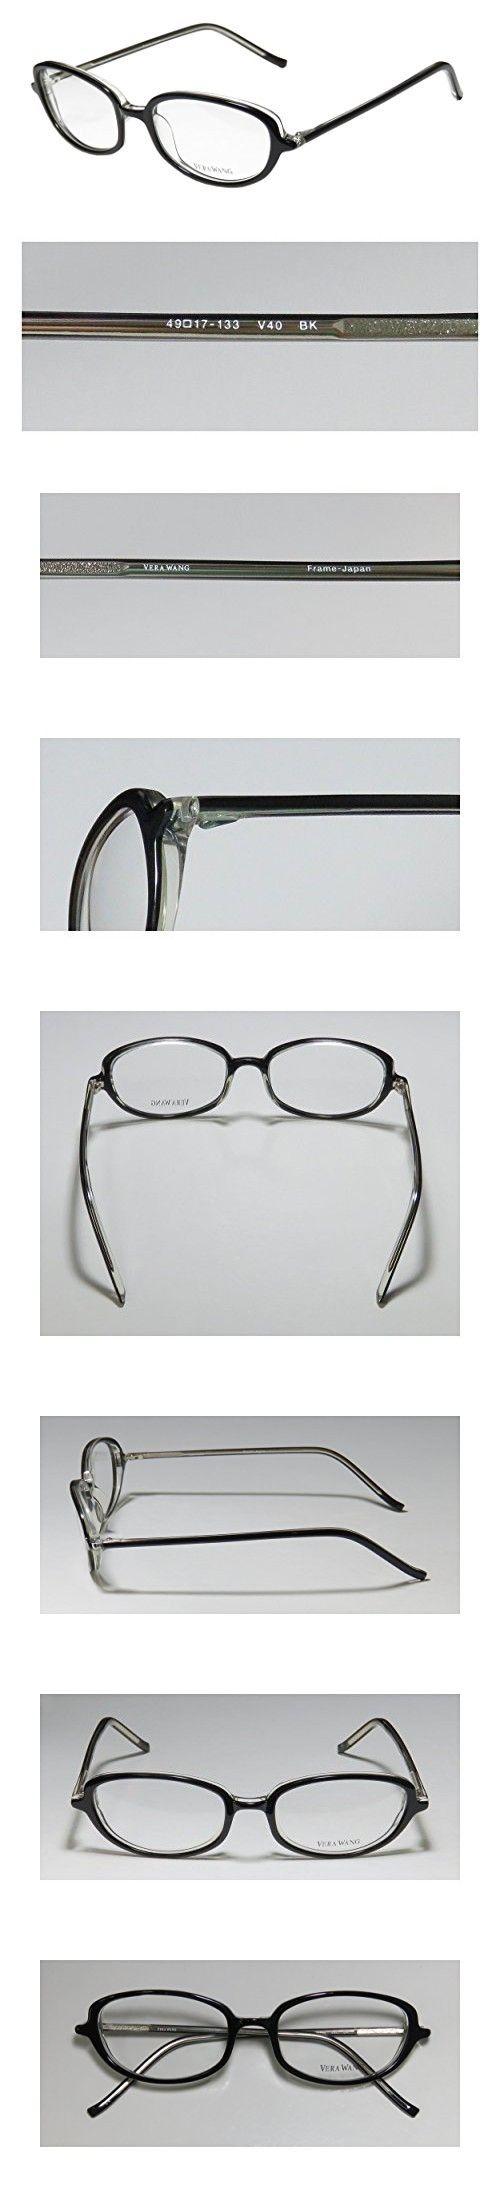 Vera Wang V40 Womens/Ladies Ophthalmic Inexpensive Designer Full-rim Eyeglasses/Eyeglass Frame (49-17-133, Black)